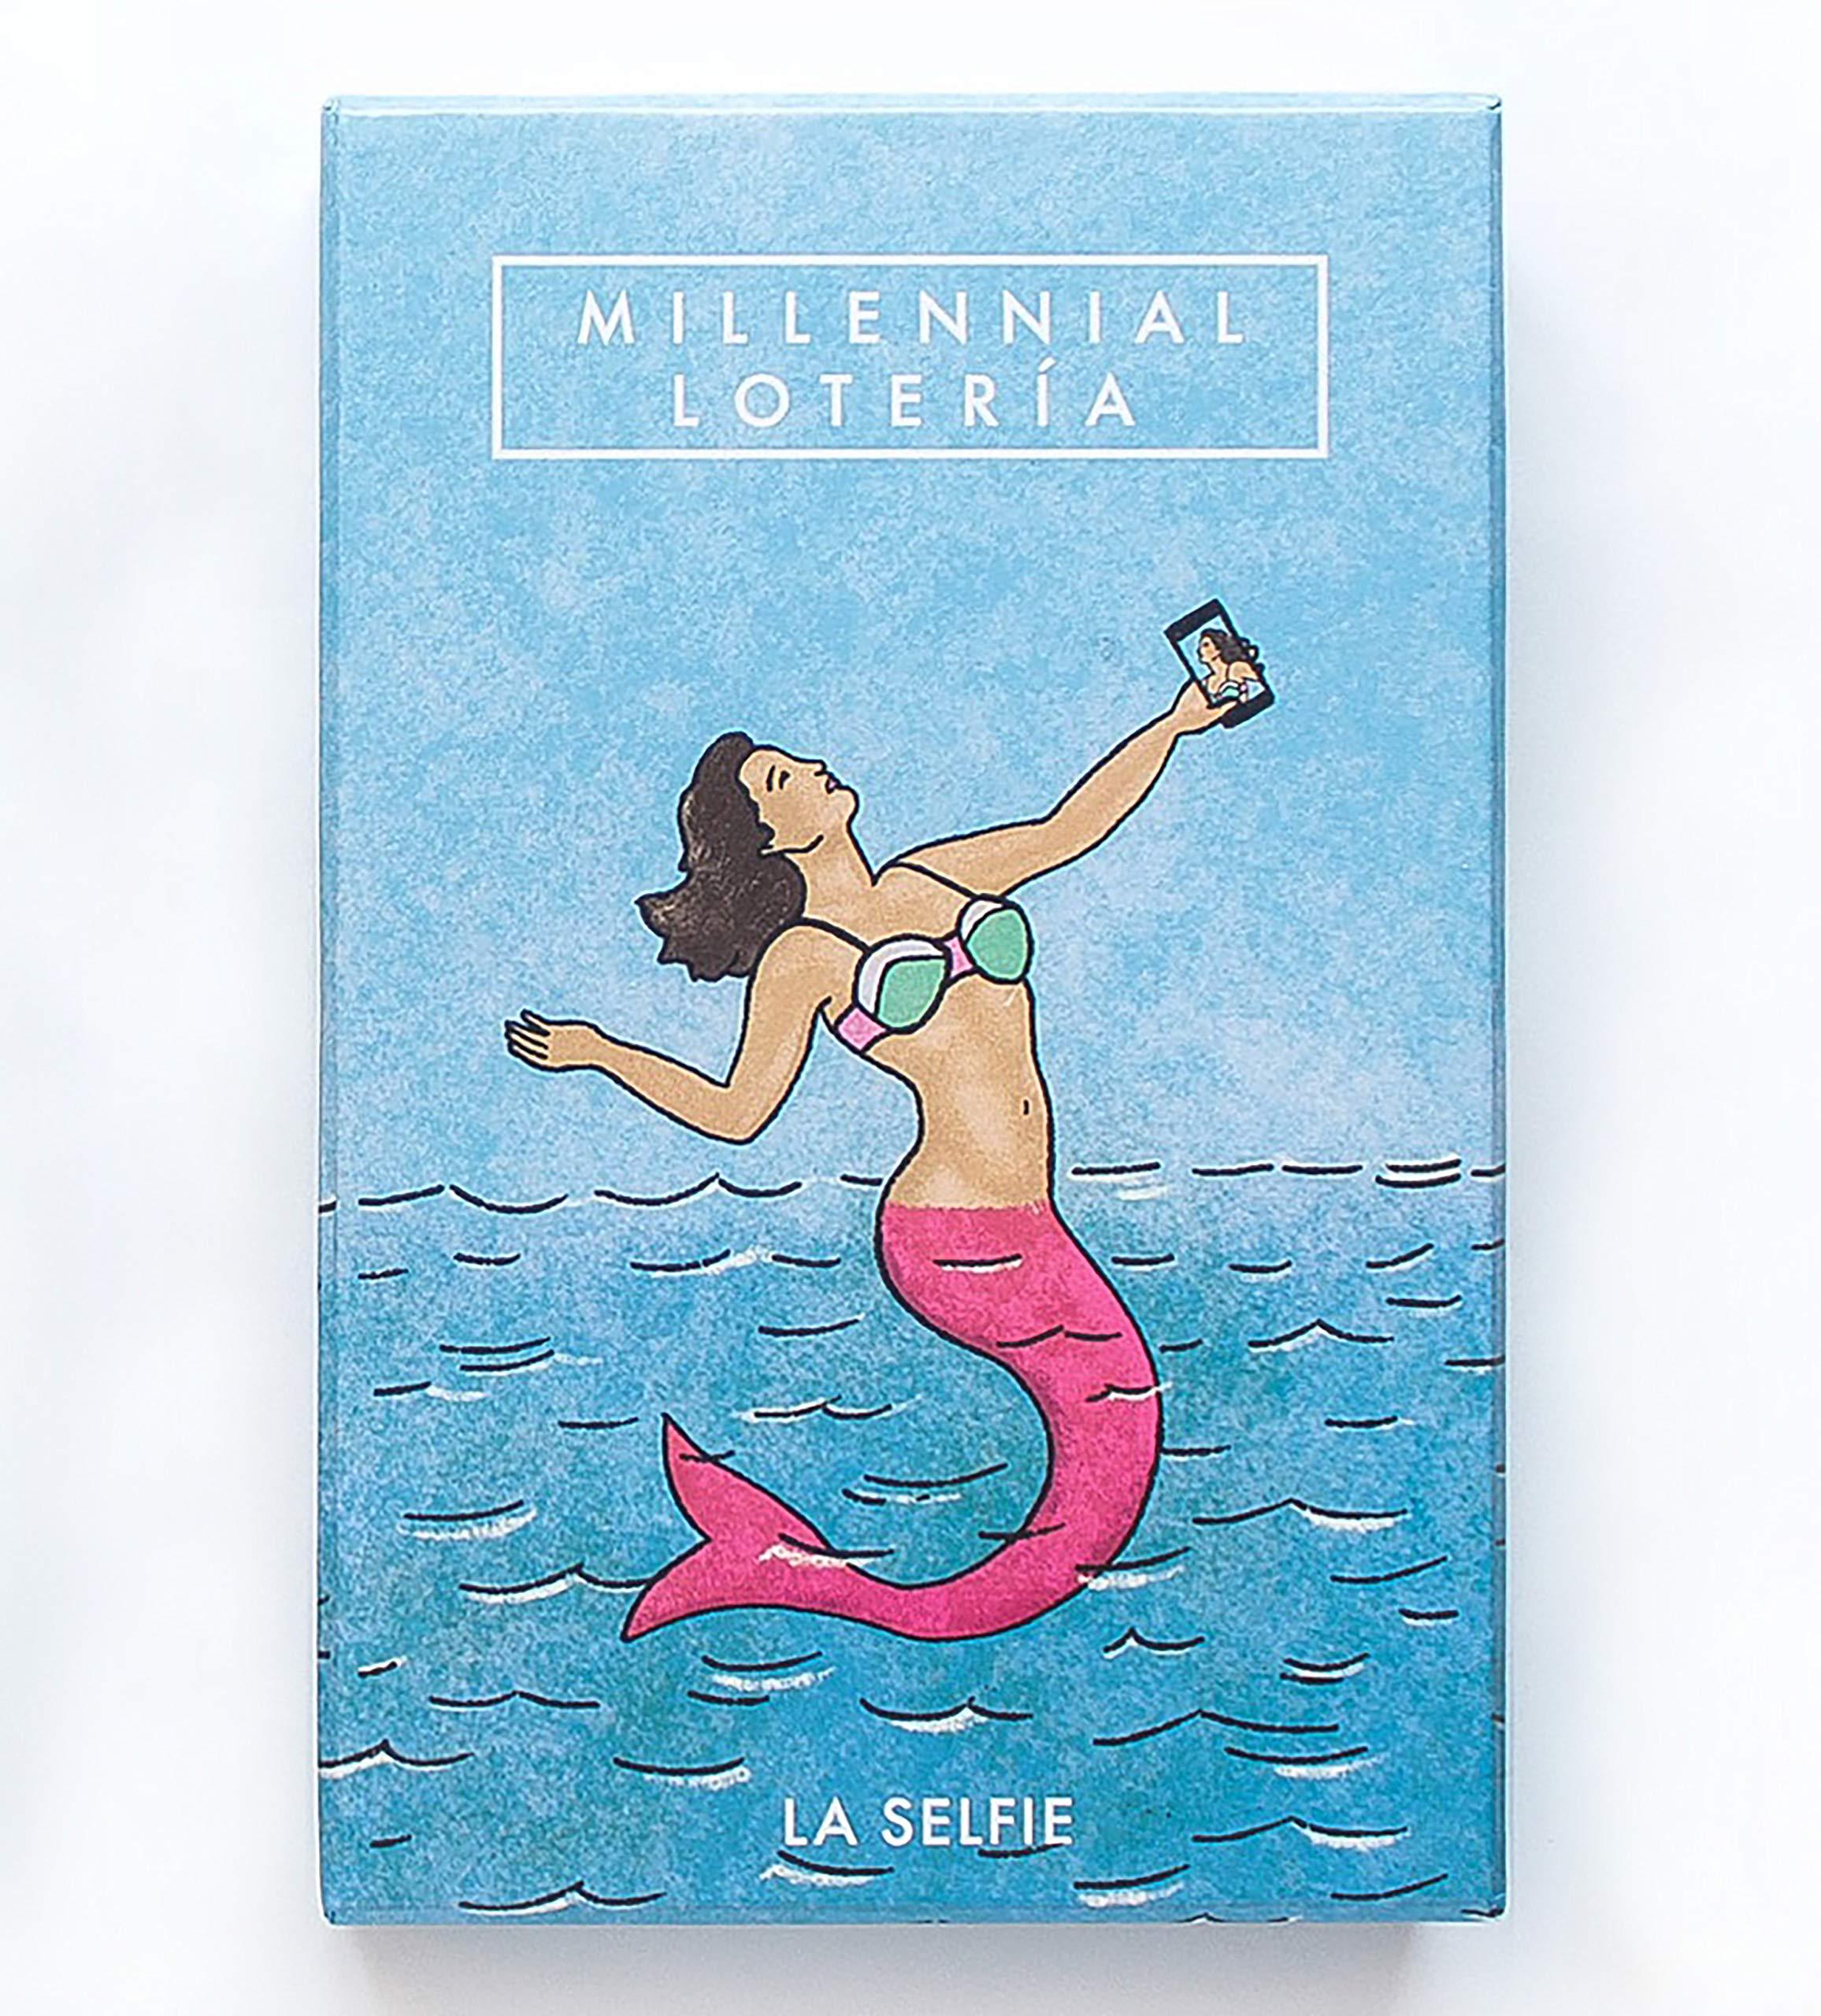 photograph regarding Free Printable Loteria Cards named : Millennial Loteria (9781944515805): Mike Alfaro